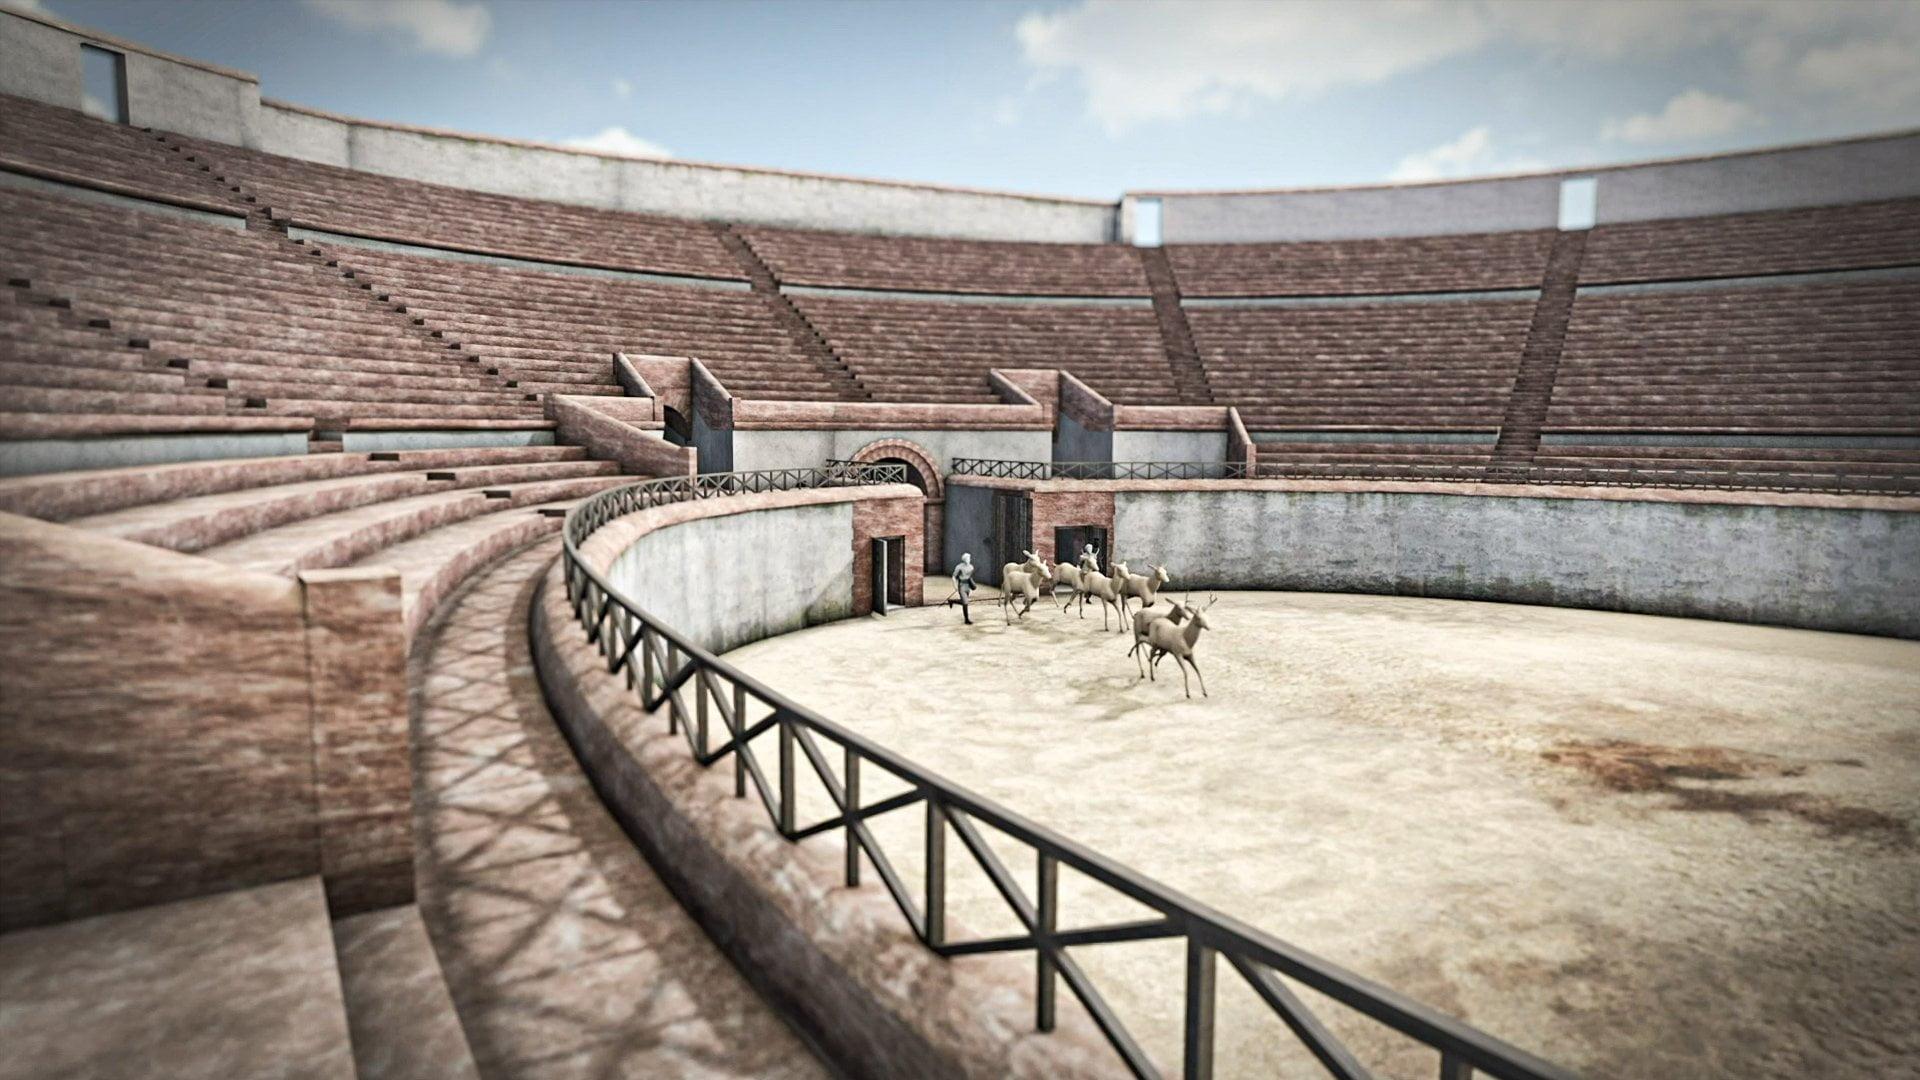 Augusta Raurica, Amphitheater, Screen, Venatio, ikonaut